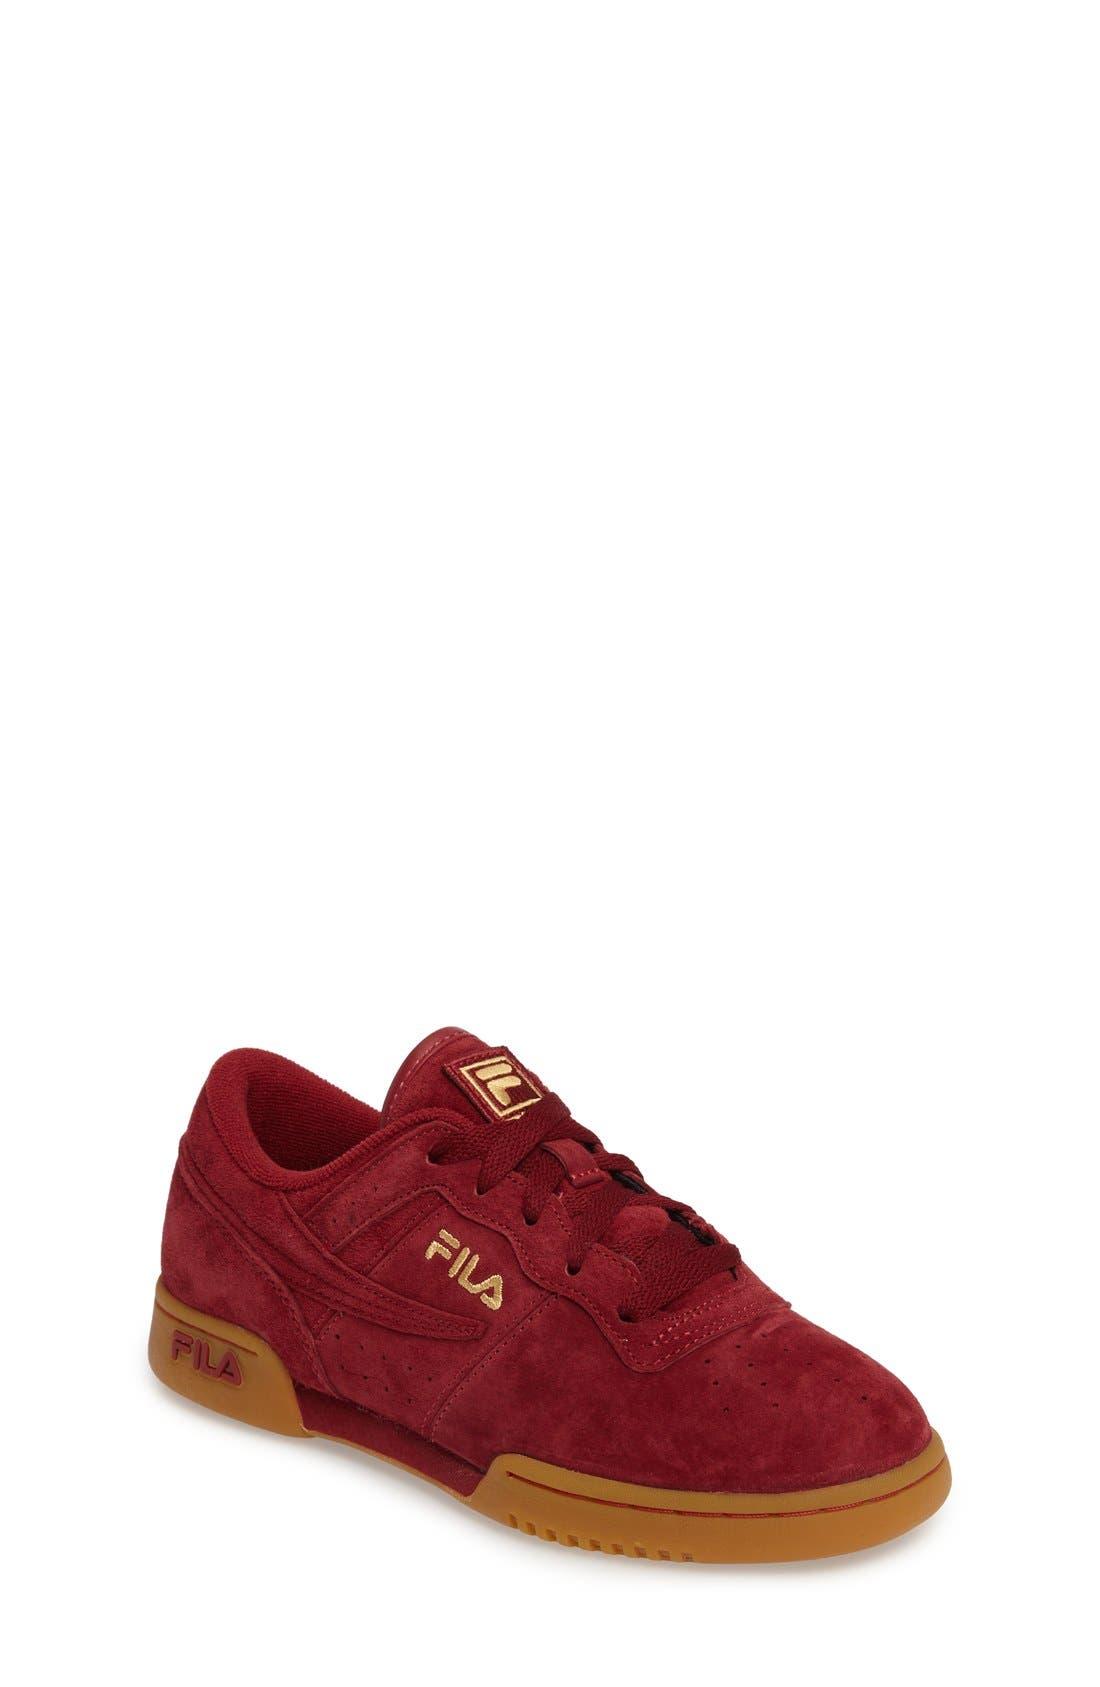 Alternate Image 1 Selected - FILA Heritage Sneaker (Big Kid)